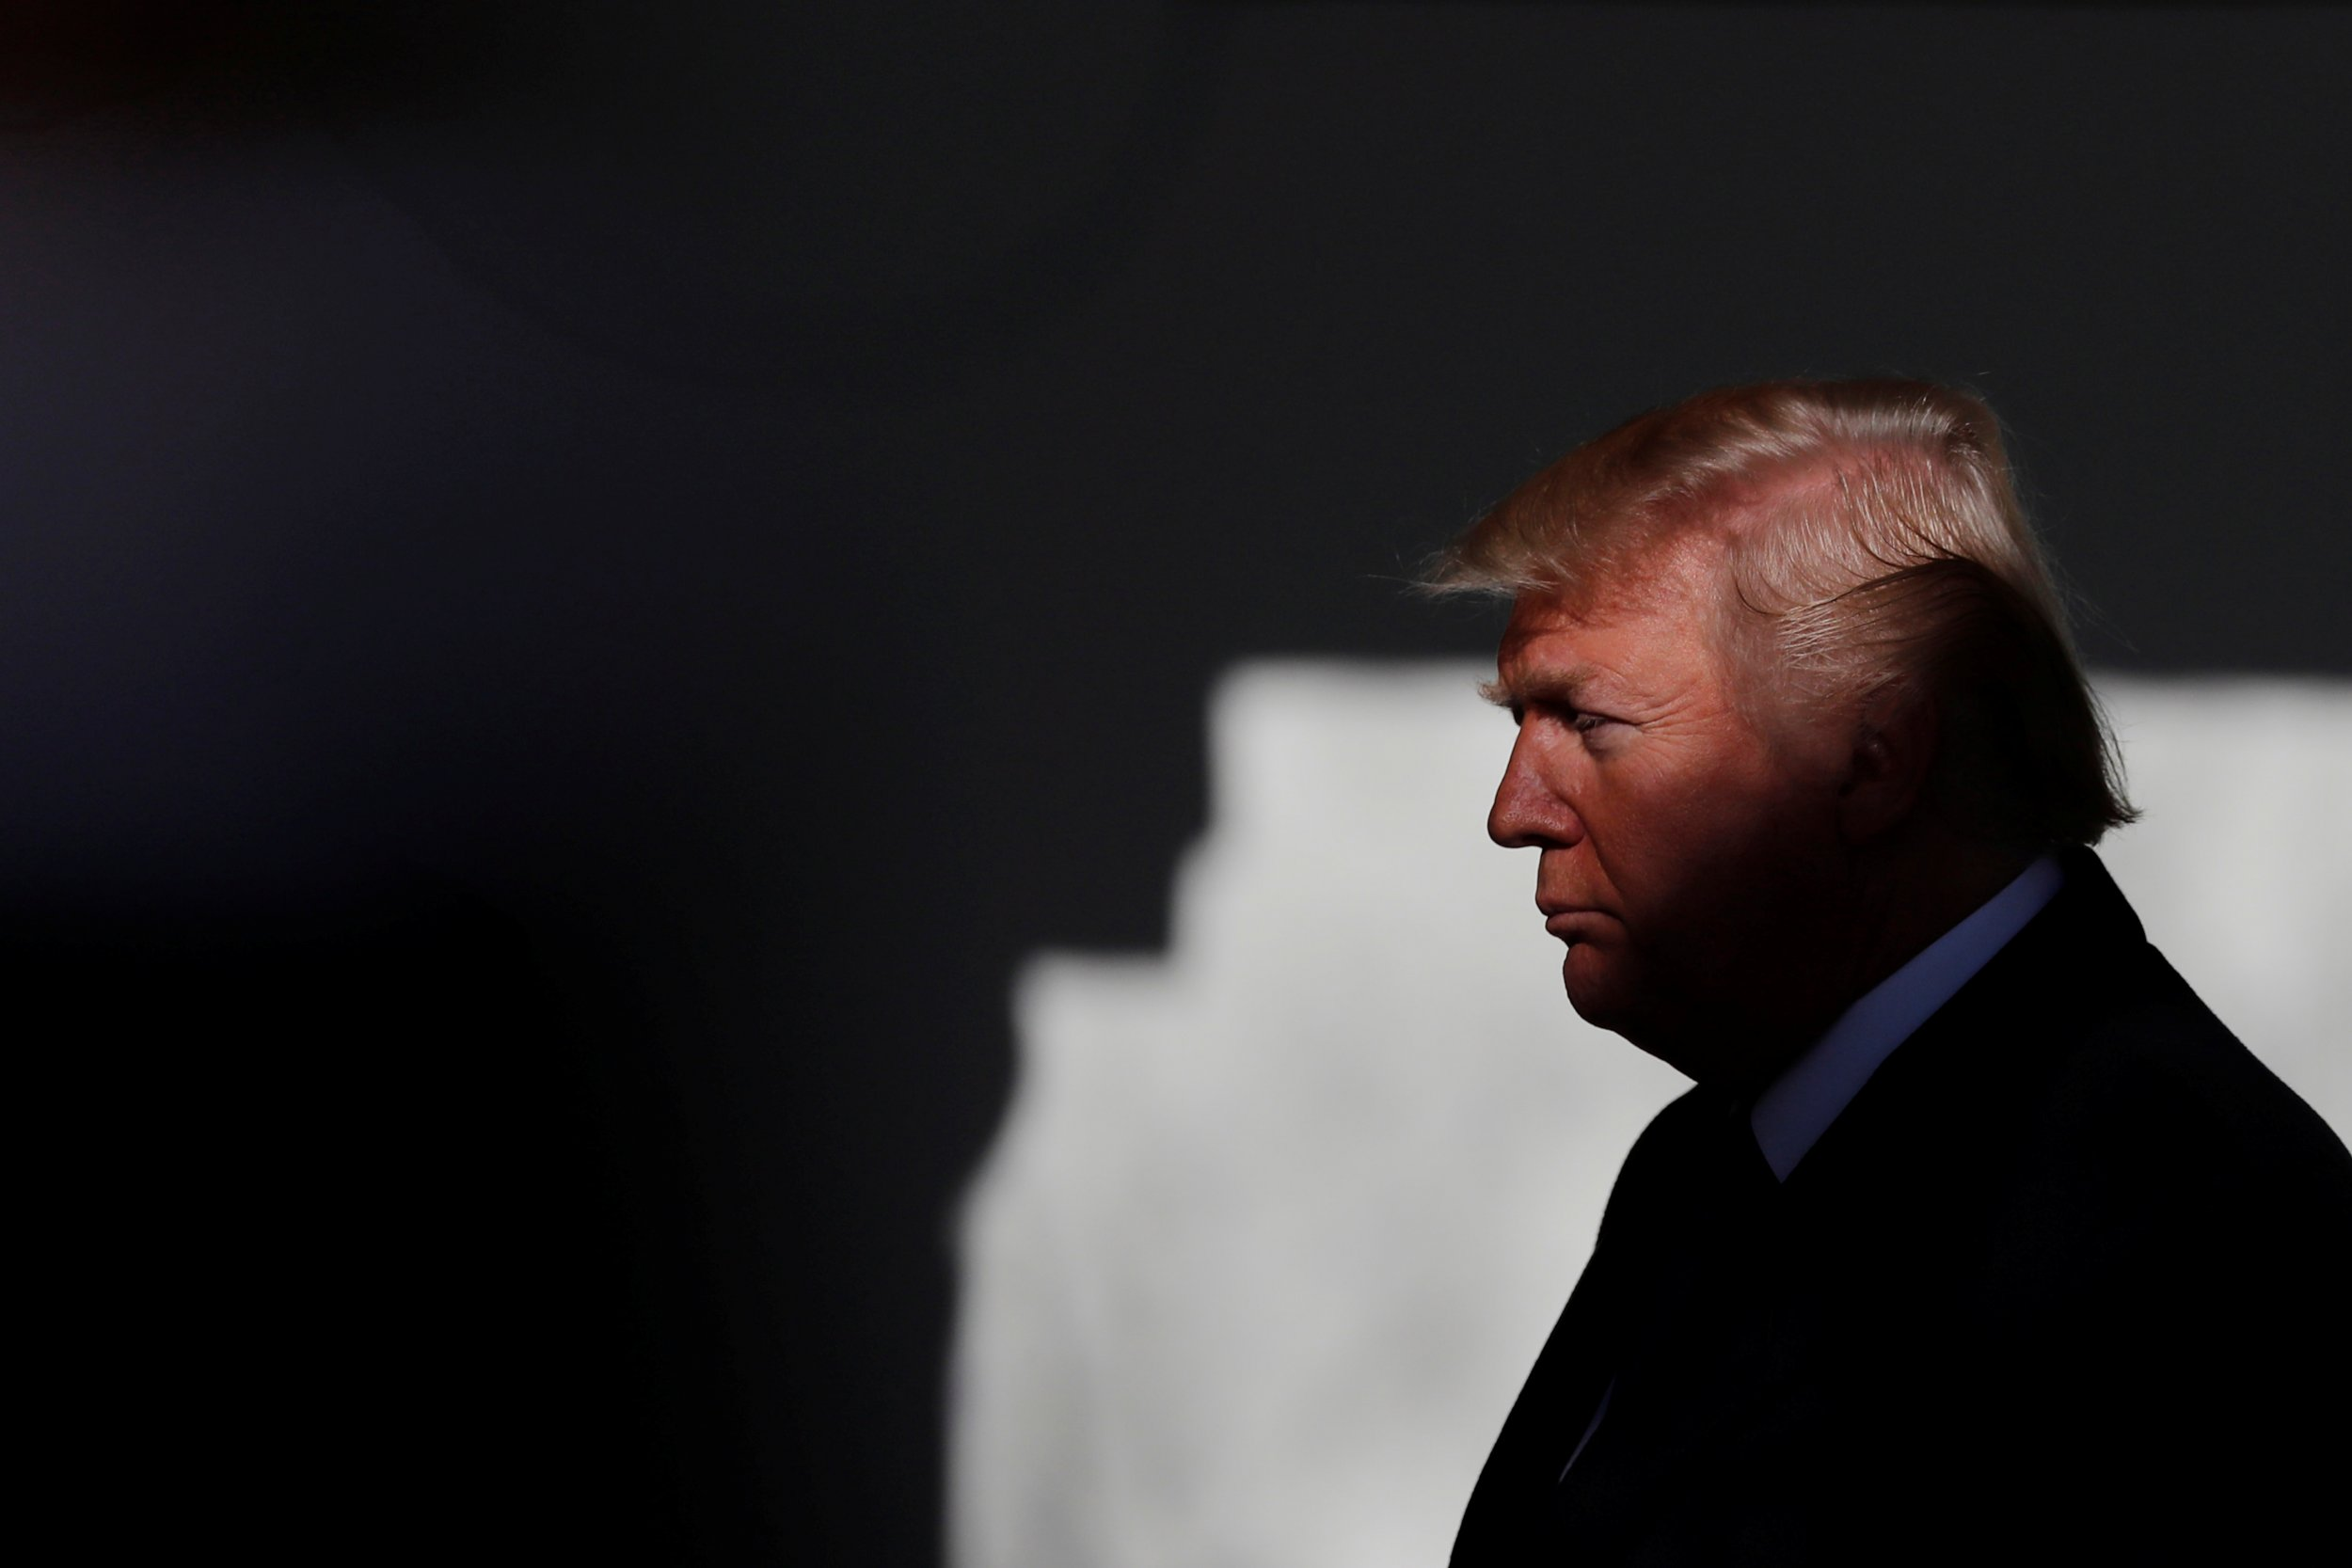 01_19_DonaldTrump